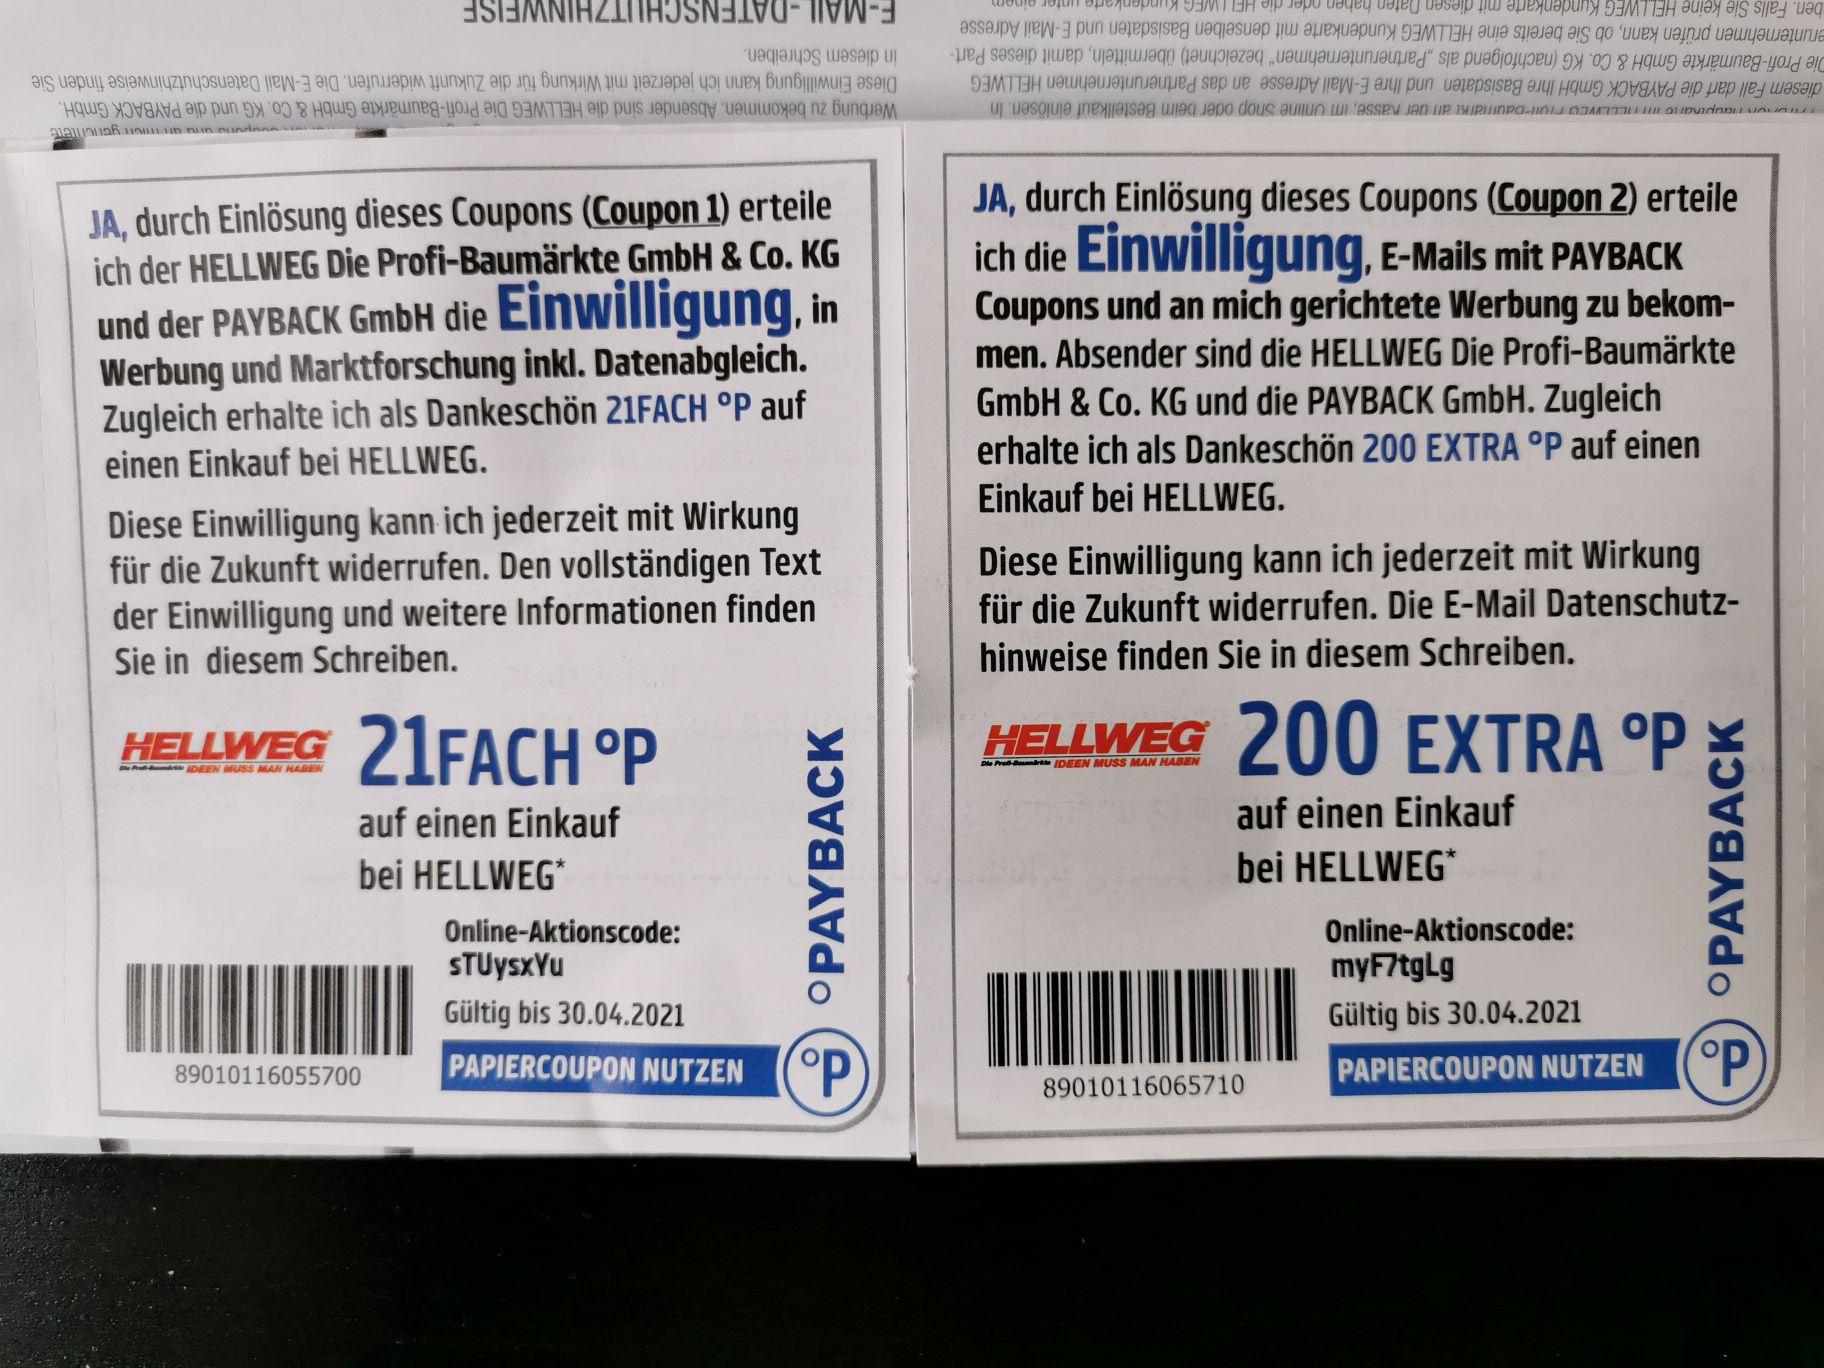 21fach + 200 extra Payback-Punkte bei Hellweg